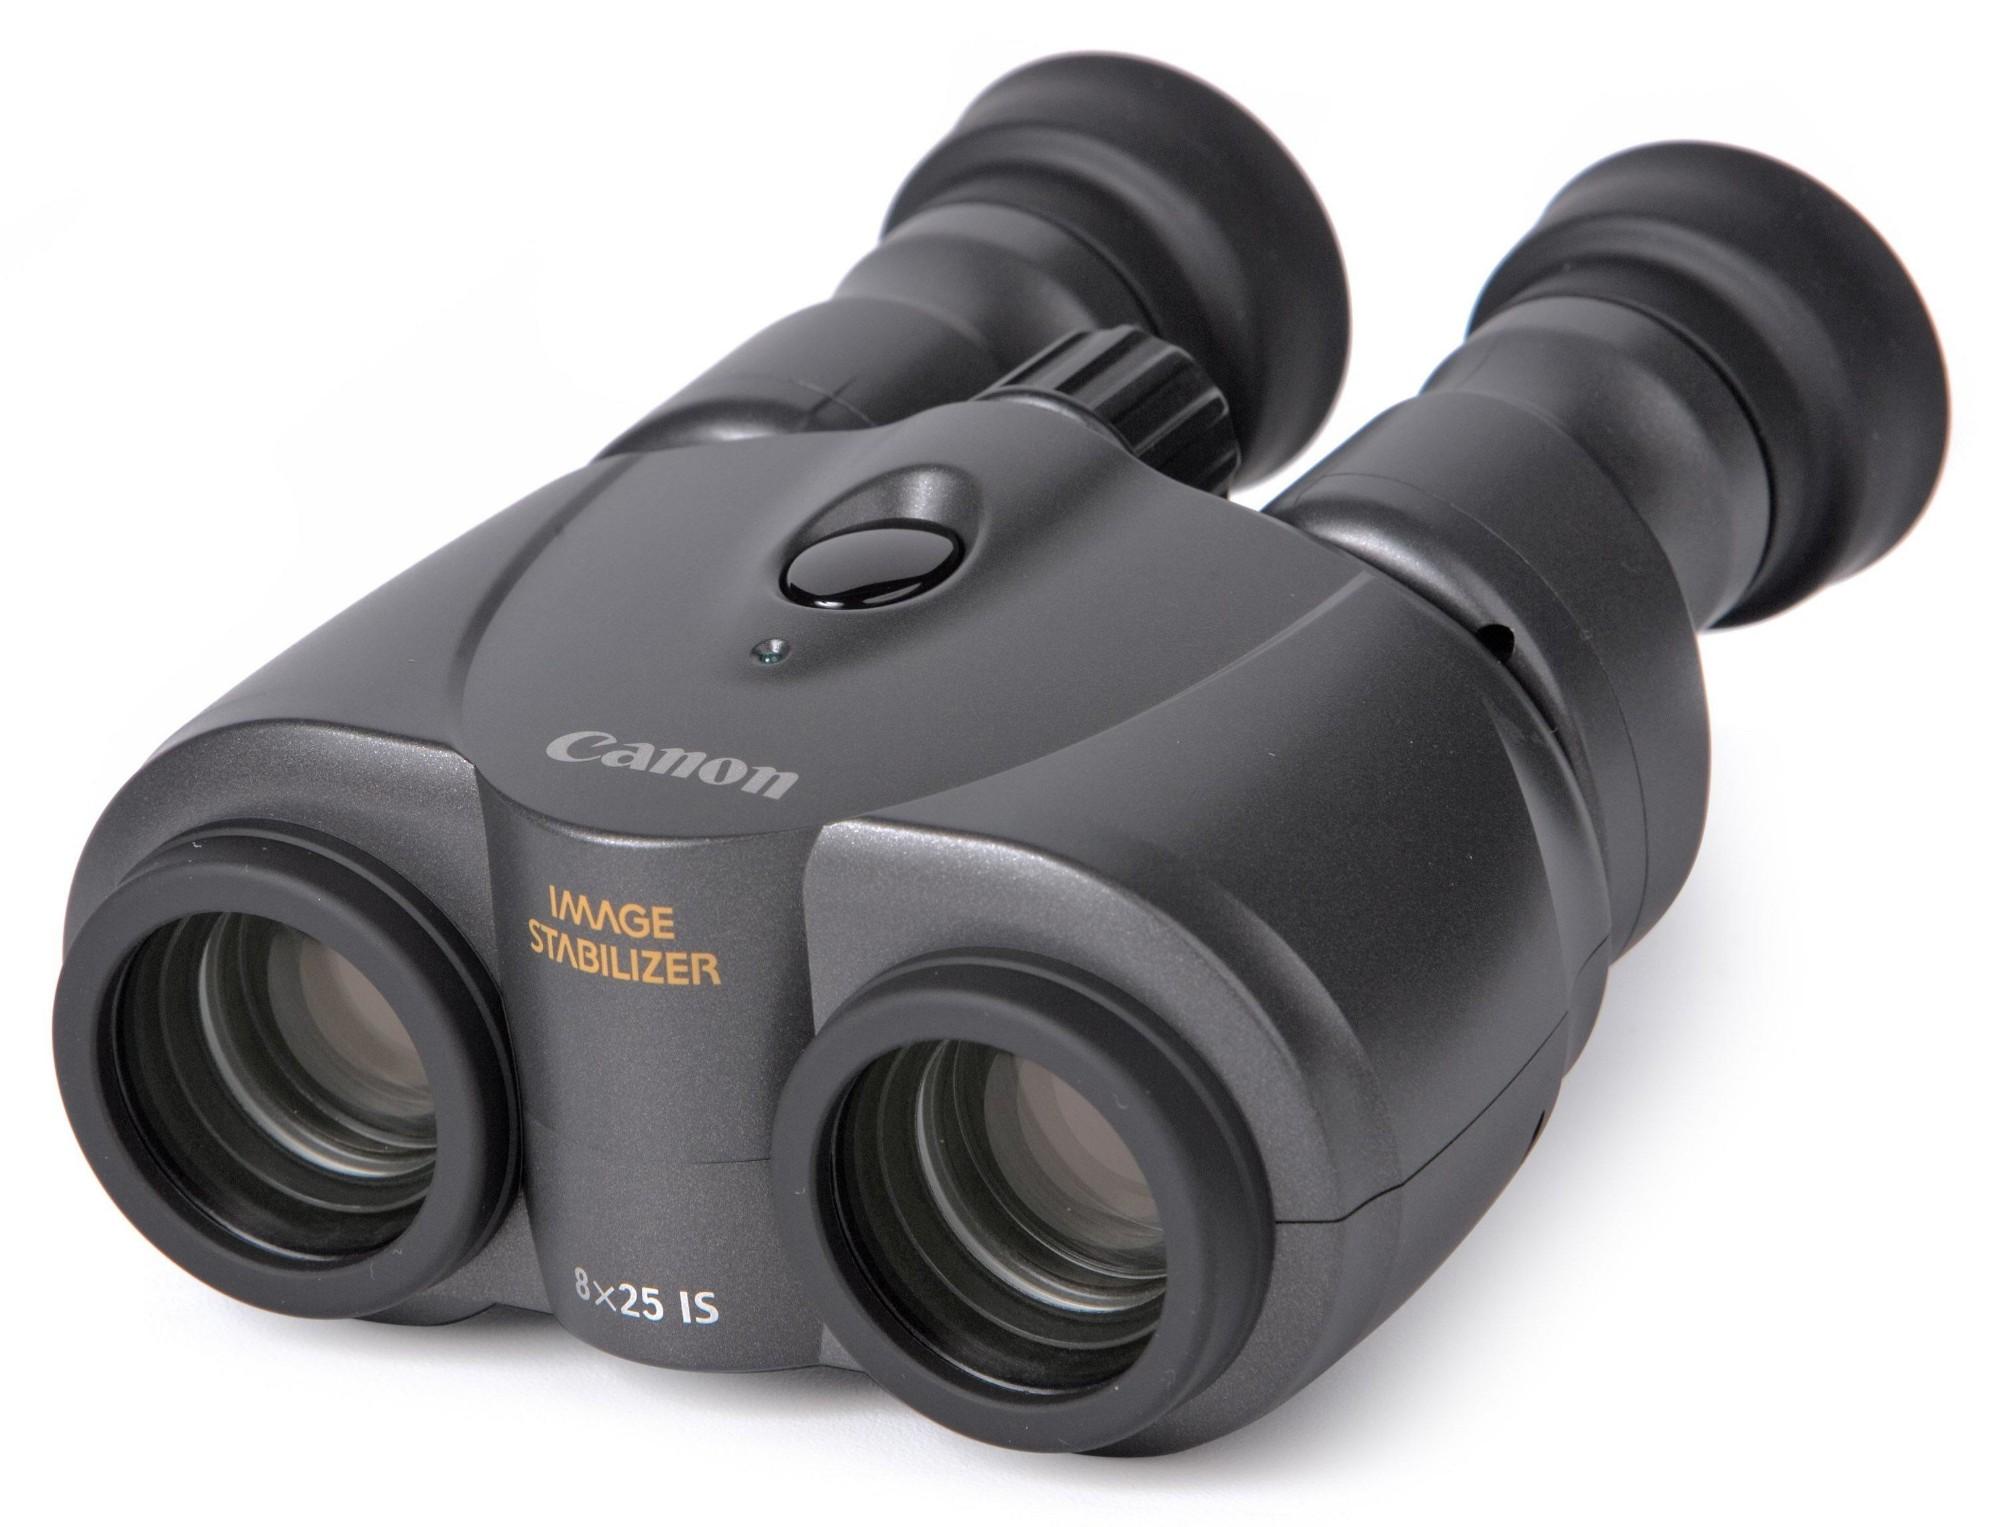 Binocular Image Stabilisation 8x25 Is